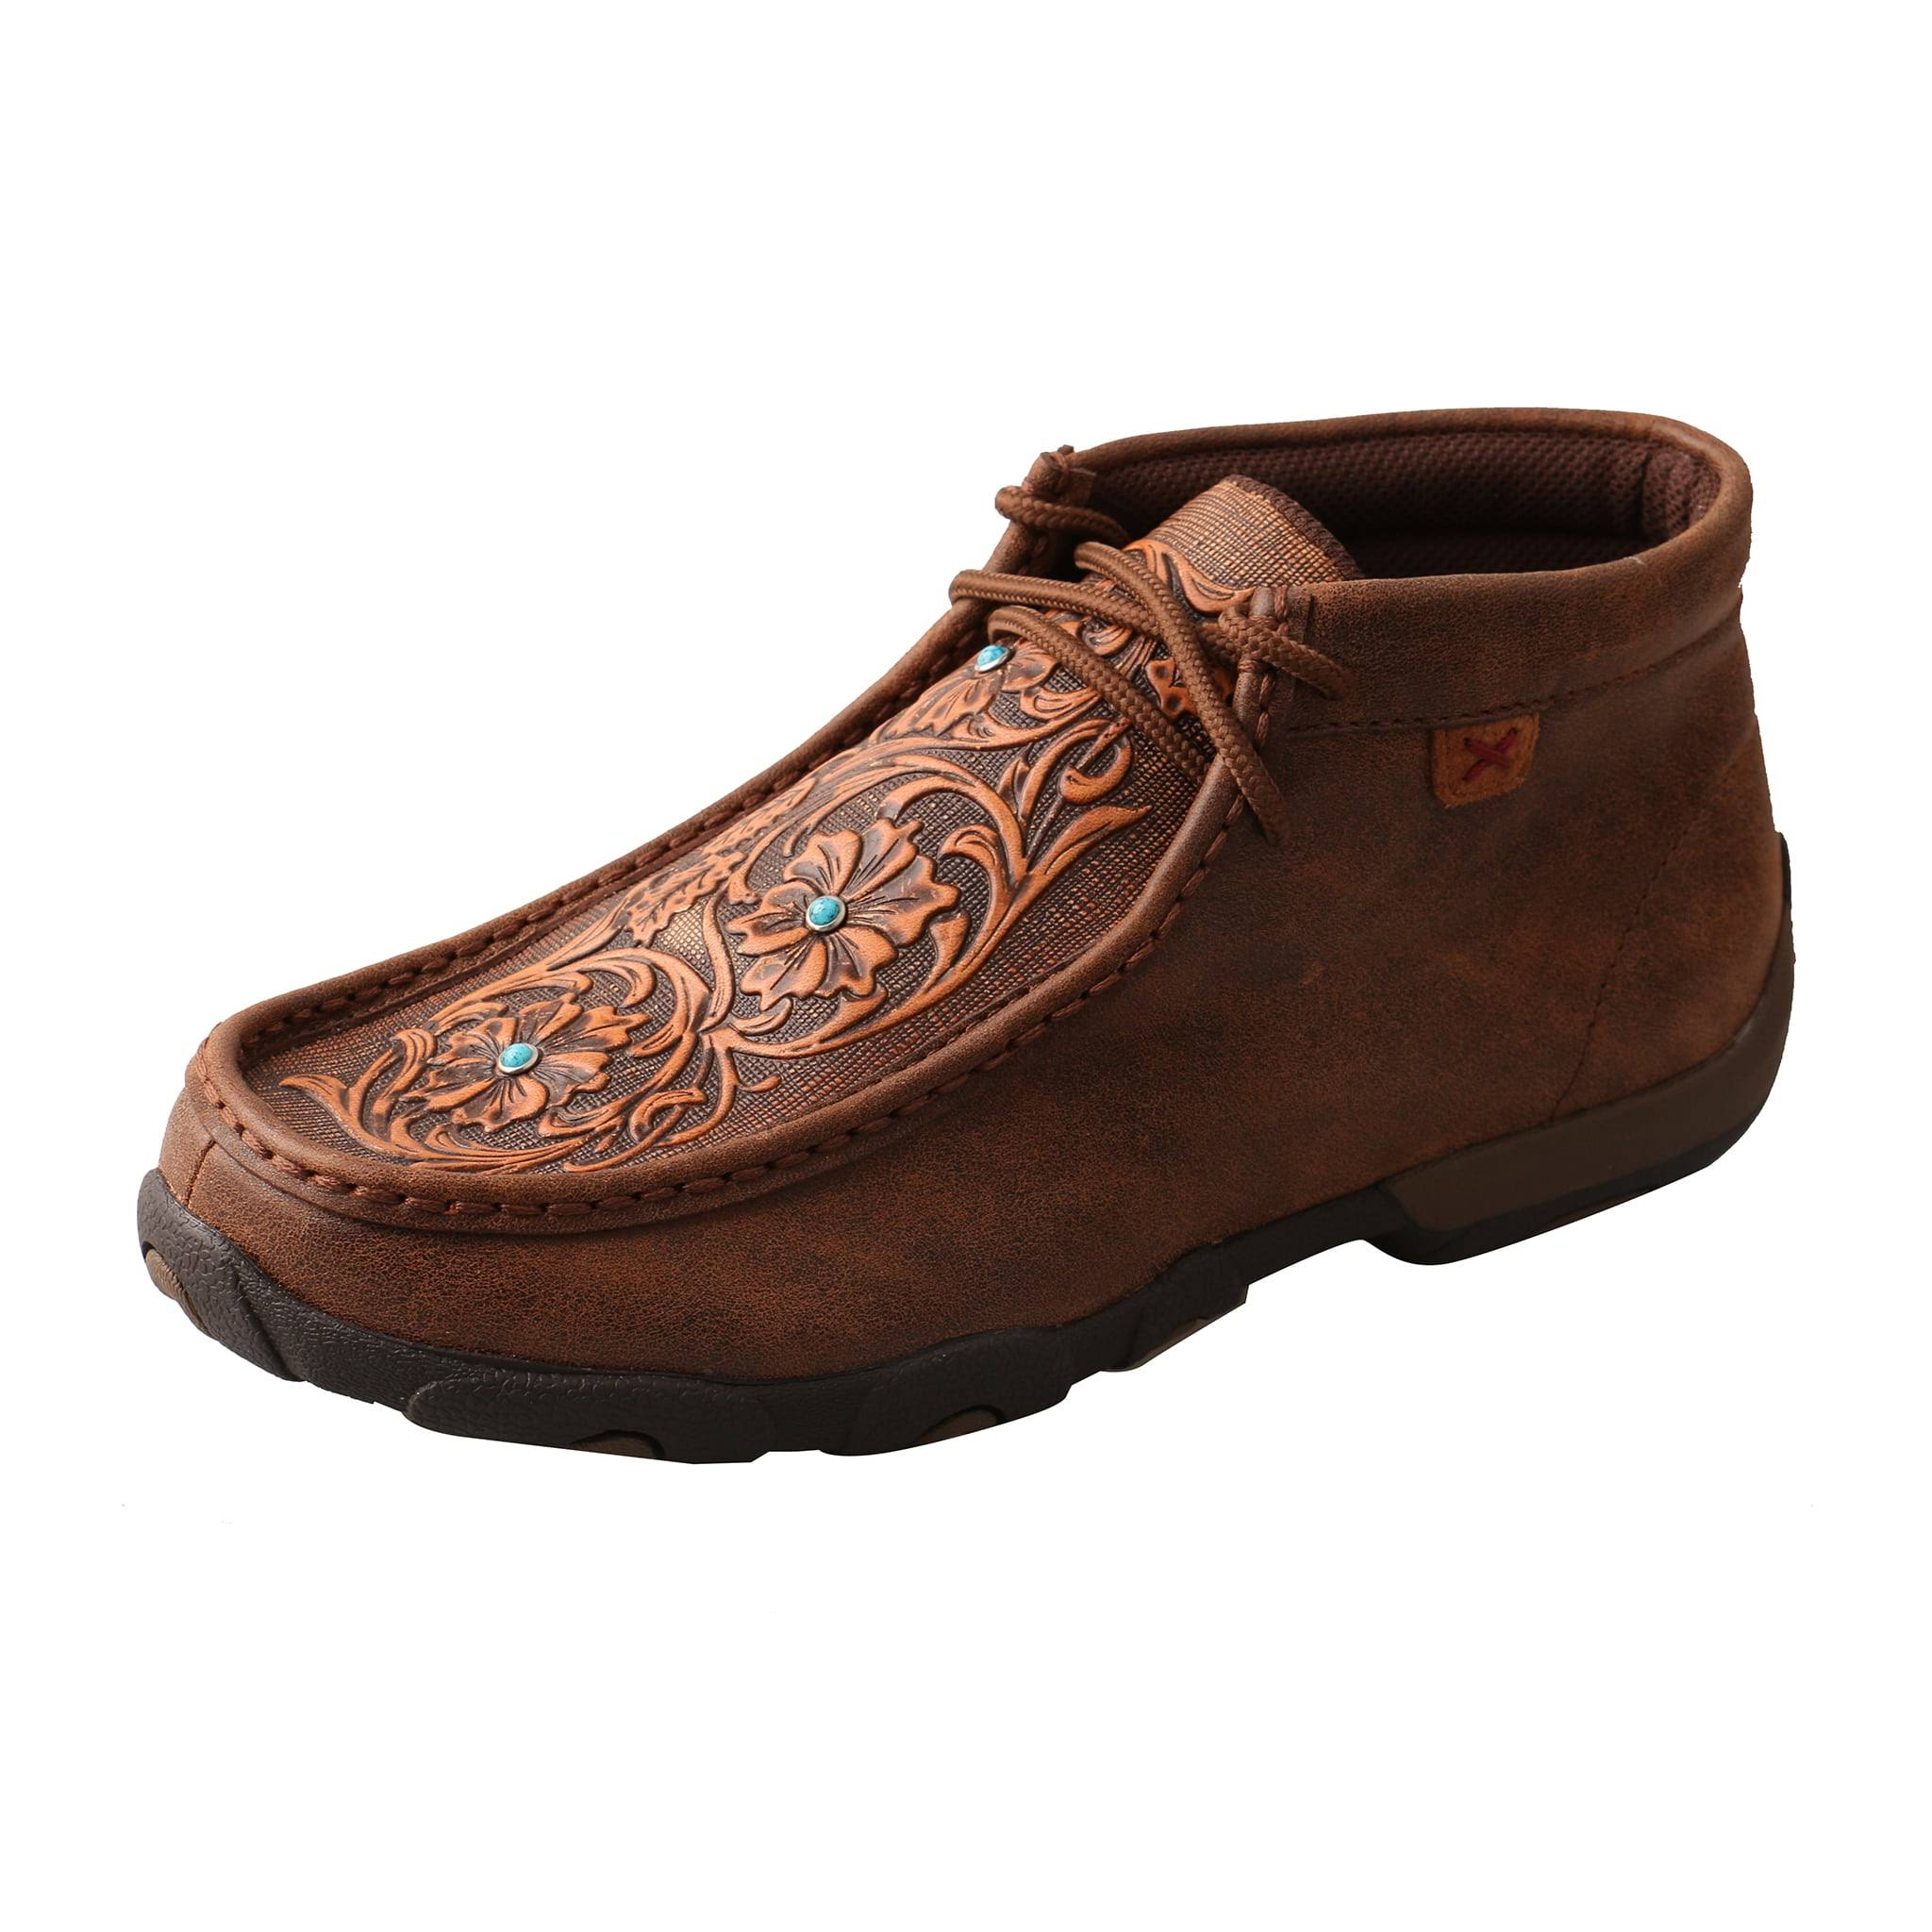 Casual Wdm0081 bruin bewerkt Twisted Dames schoenen X Moc roCWdBeEQx